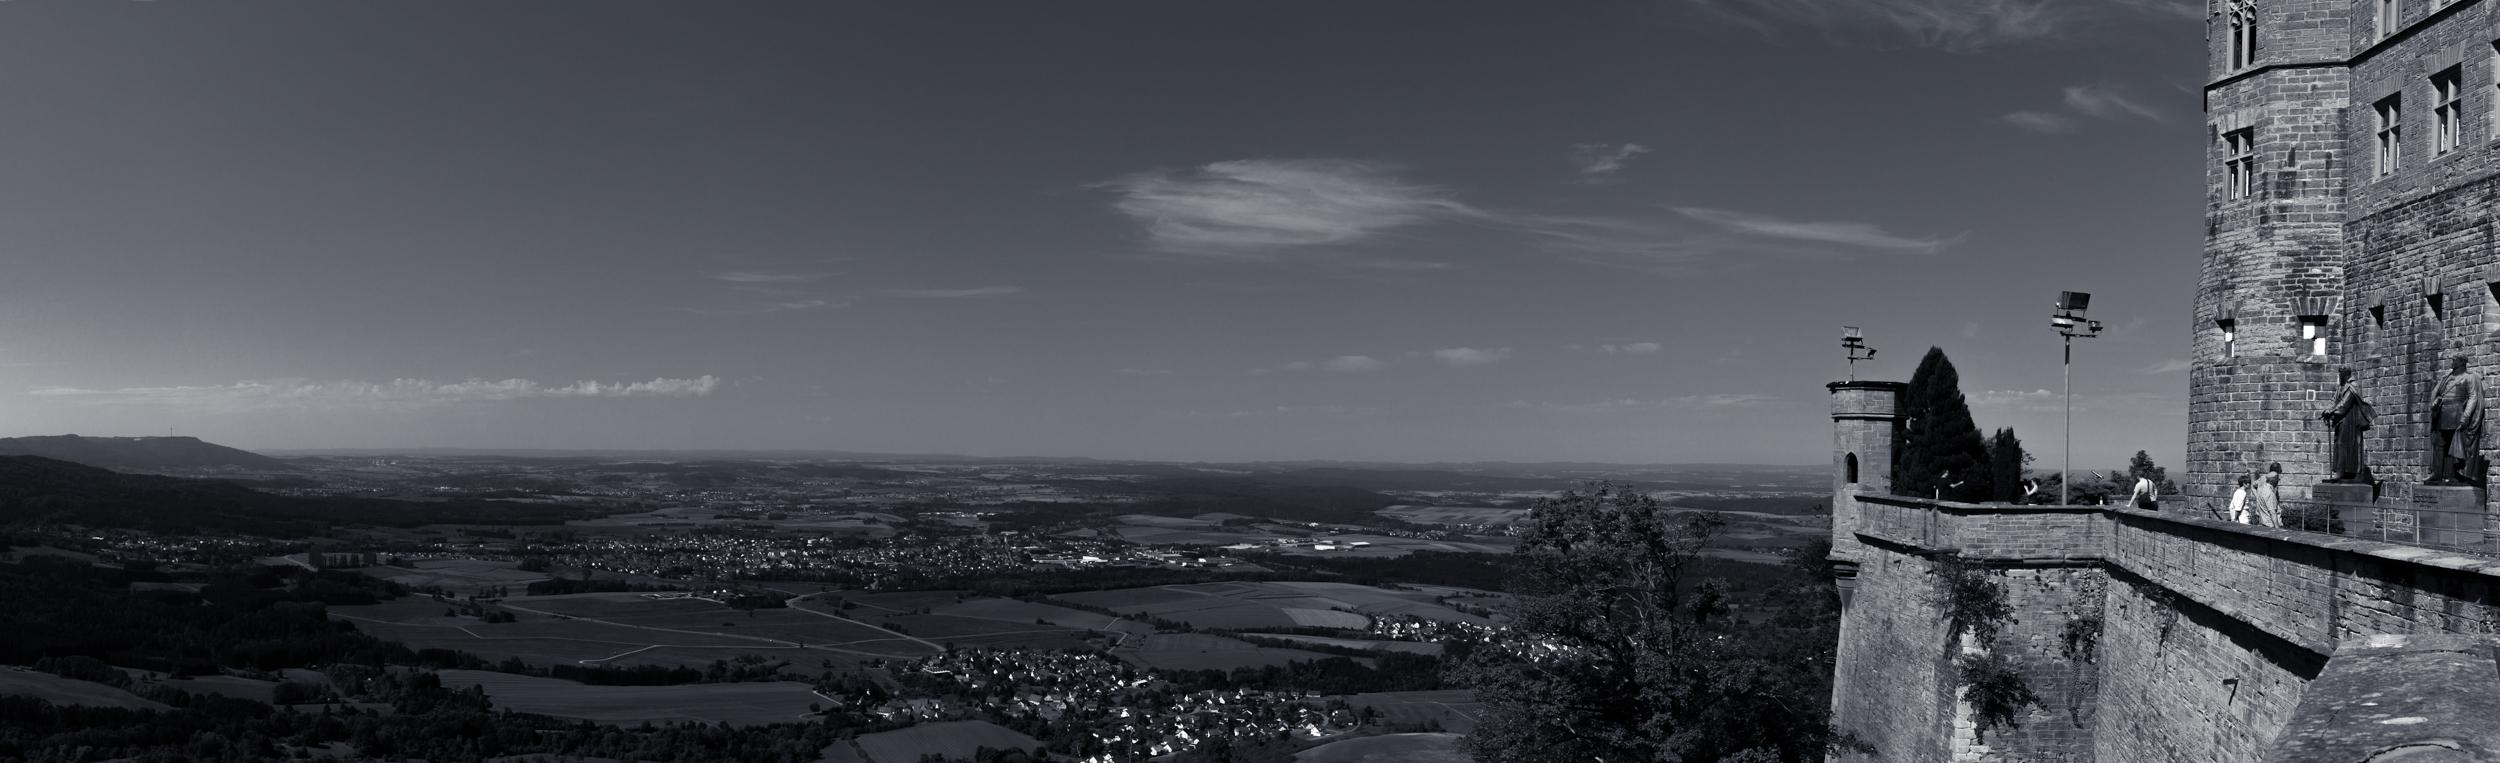 35 mm-20150830-114251- Burg Hohenzollern-Pano_.jpg